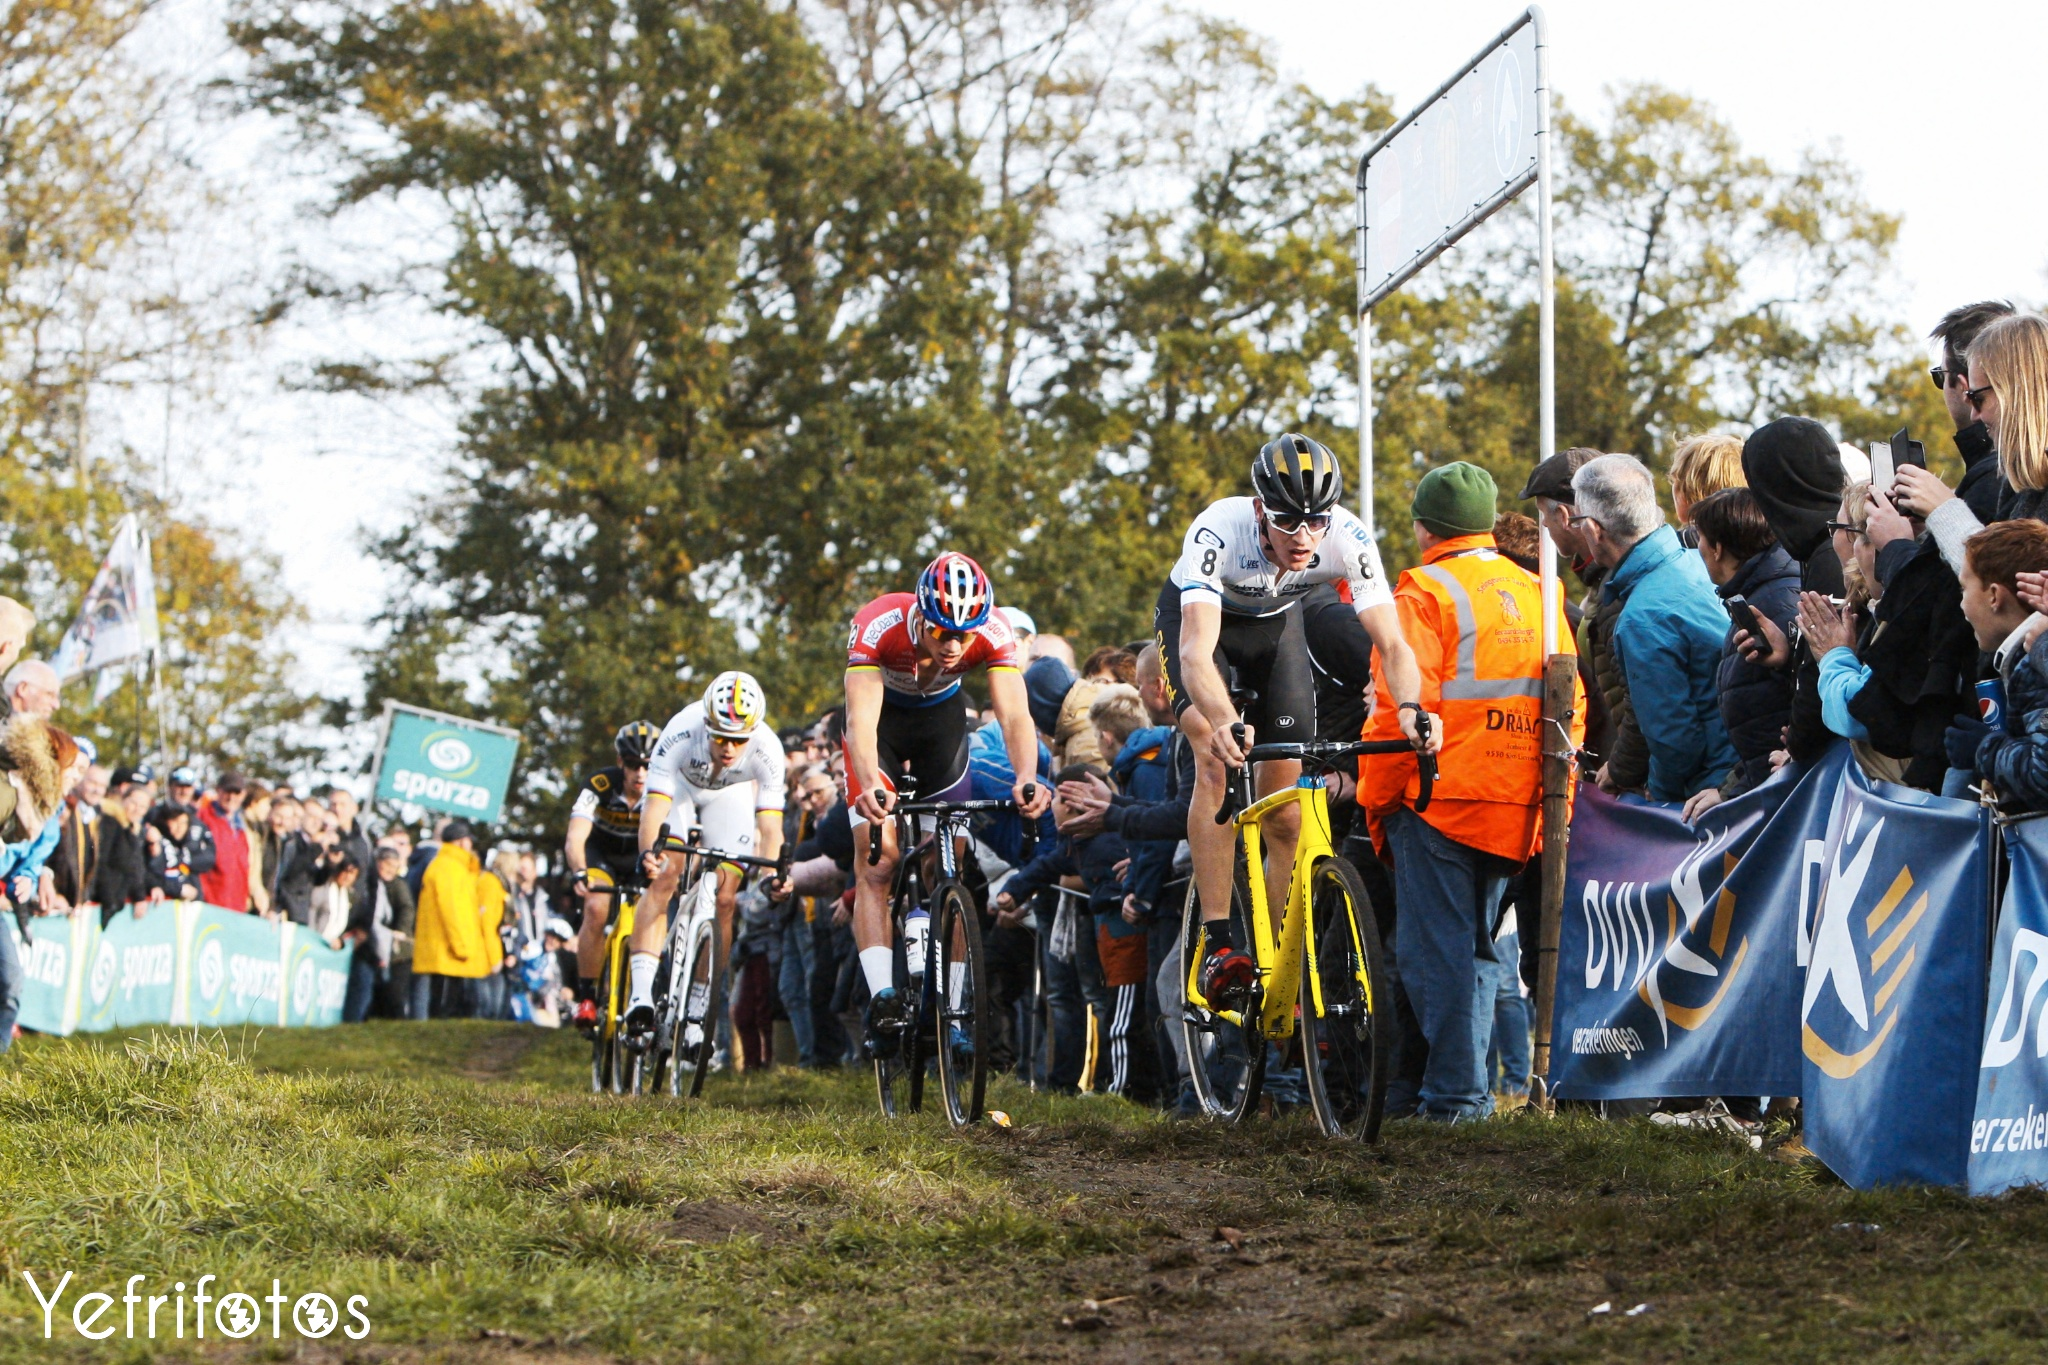 Toon Aerts - Mathieu Van der Poel - Wout van Aert - Lars van der Haar - Koppenbergcross